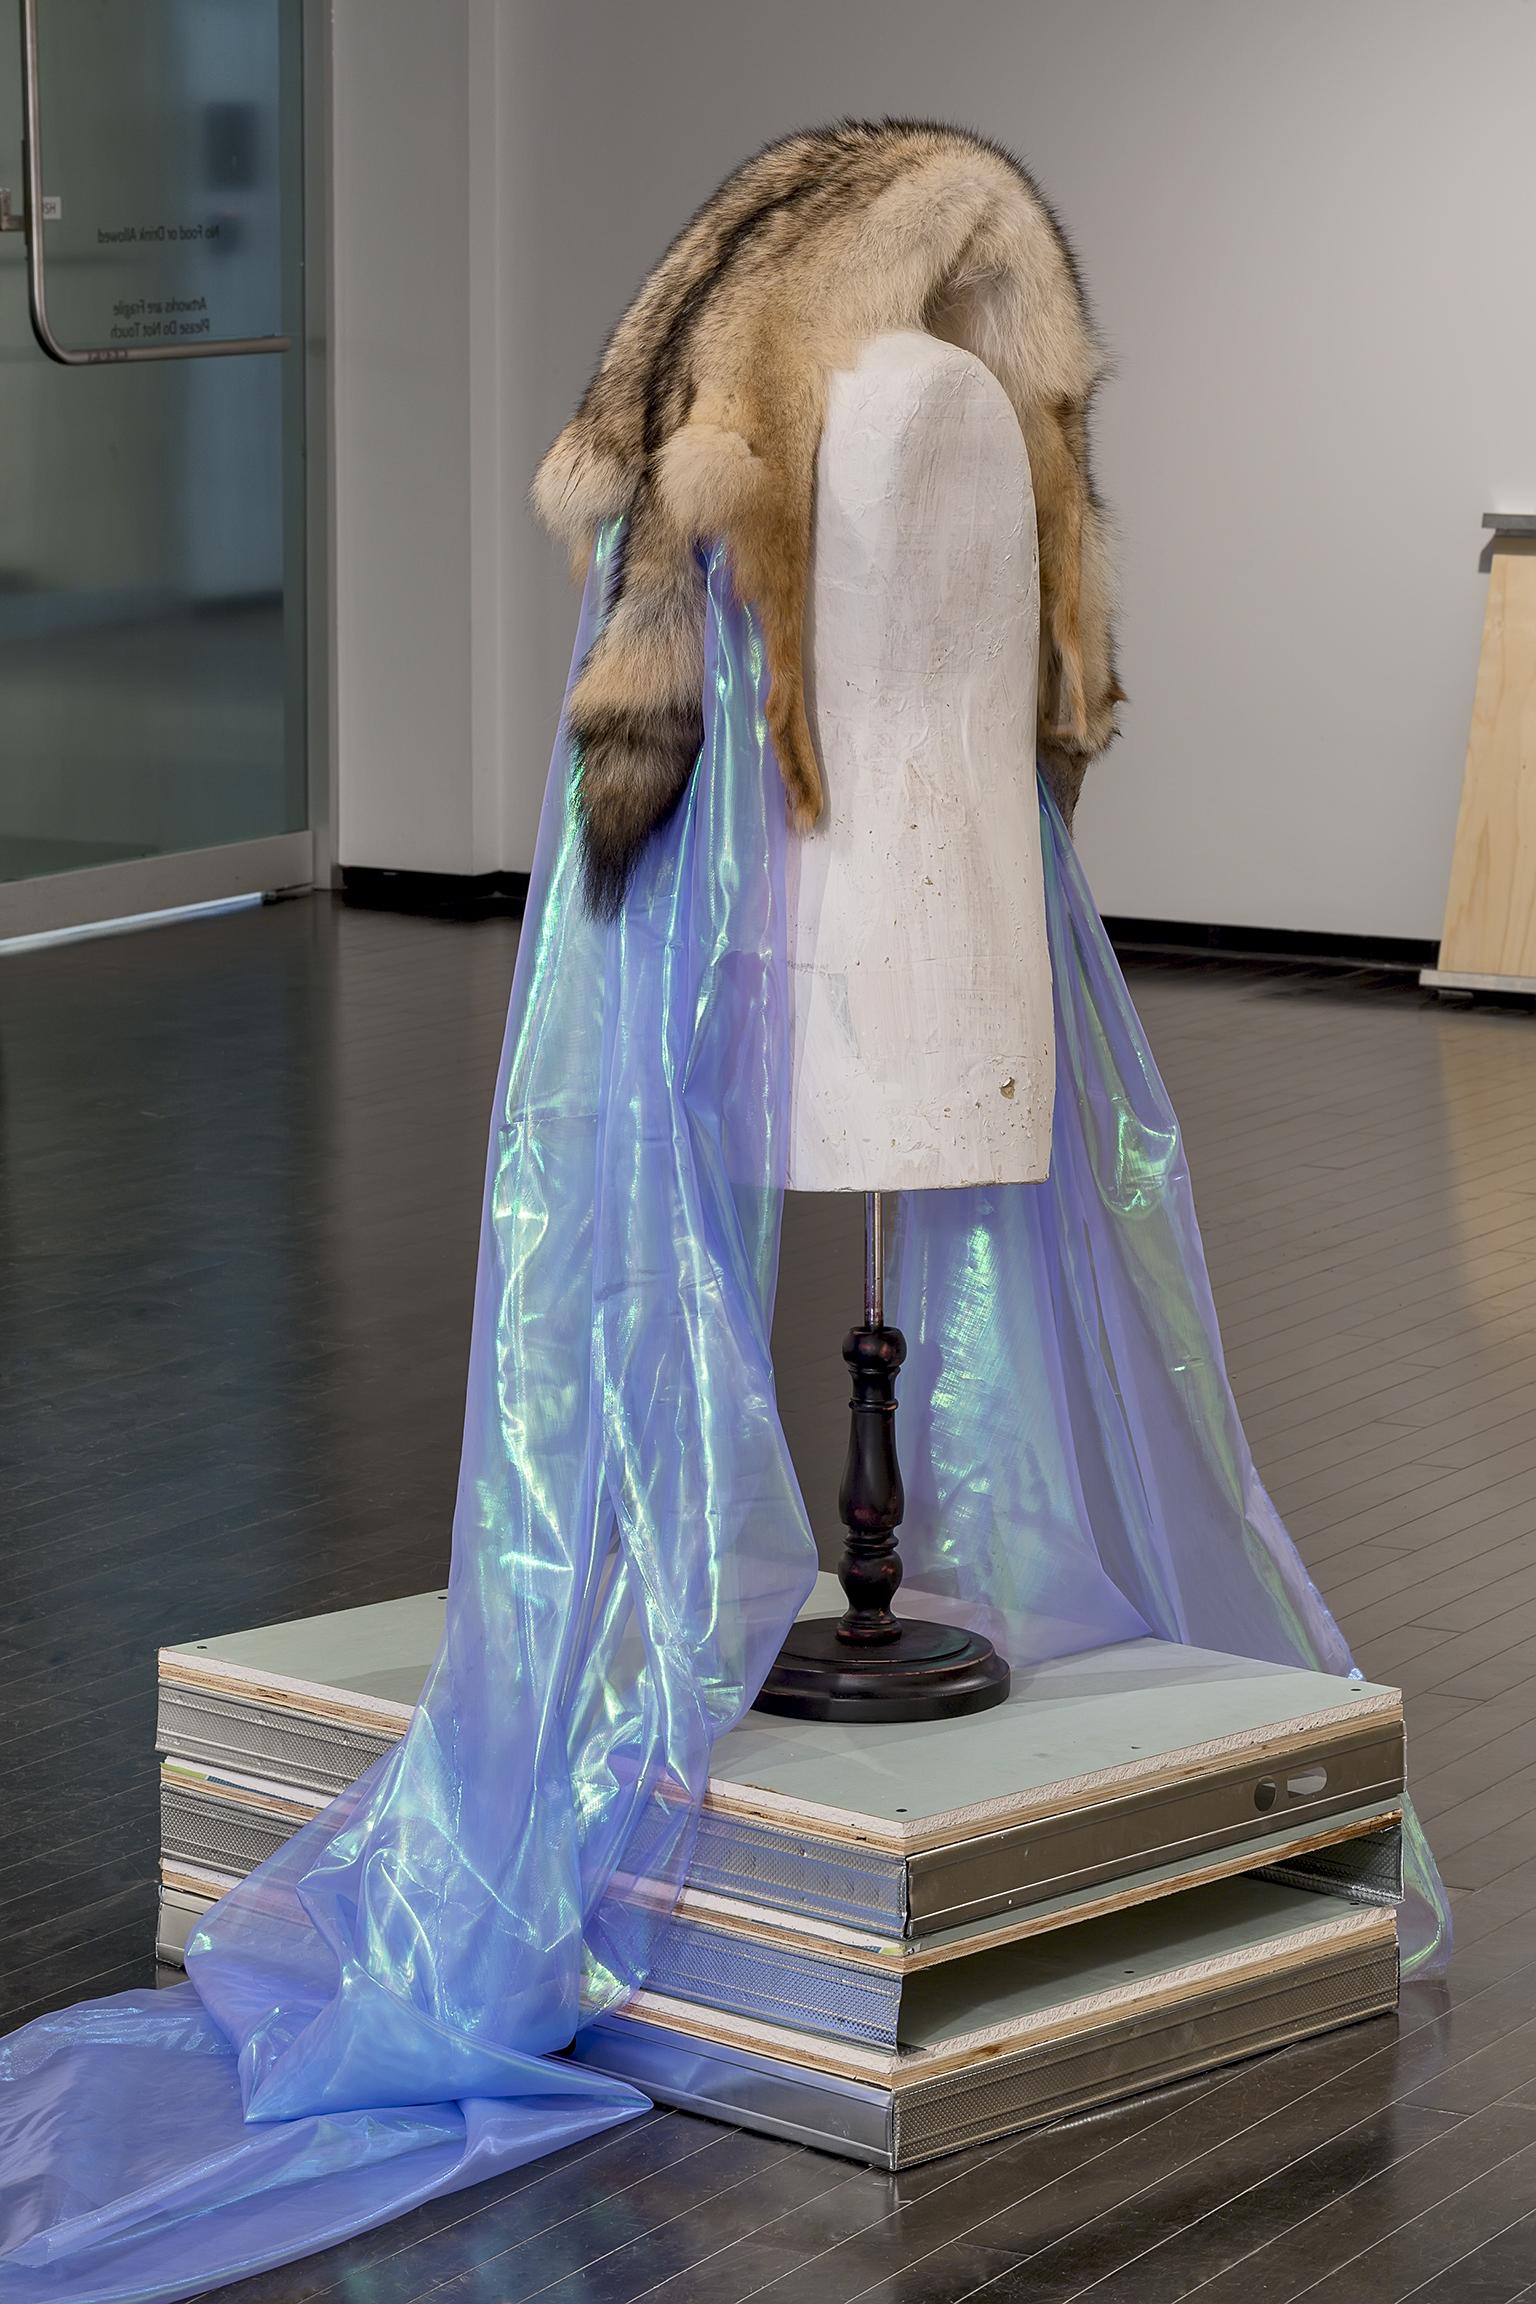 Duane Linklater, Beast of Burden, 2016, coyote fur, dress form, gypsum, steel, wood, dimensions variable by